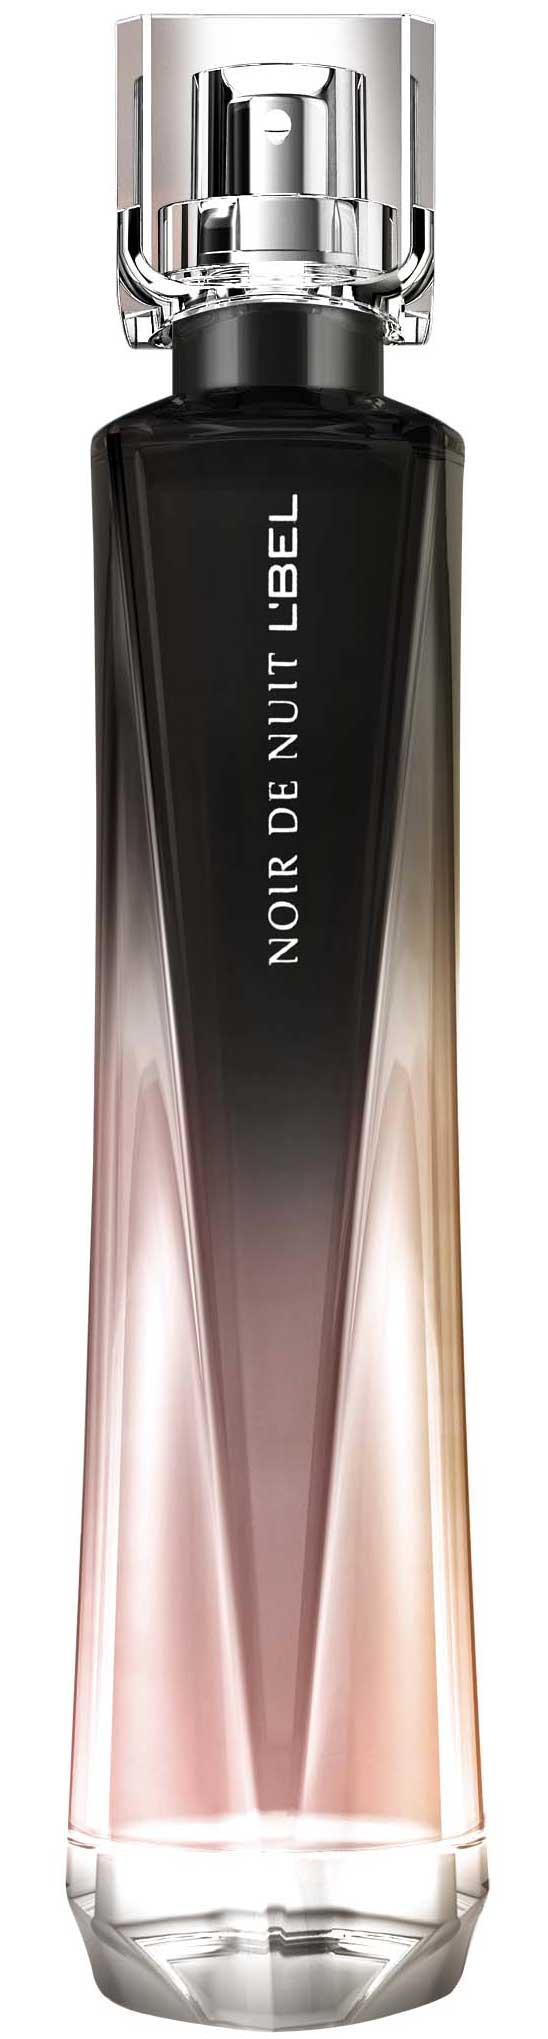 lanzamiento-noir-de-nuir-lbel-Nour-de-Nuit